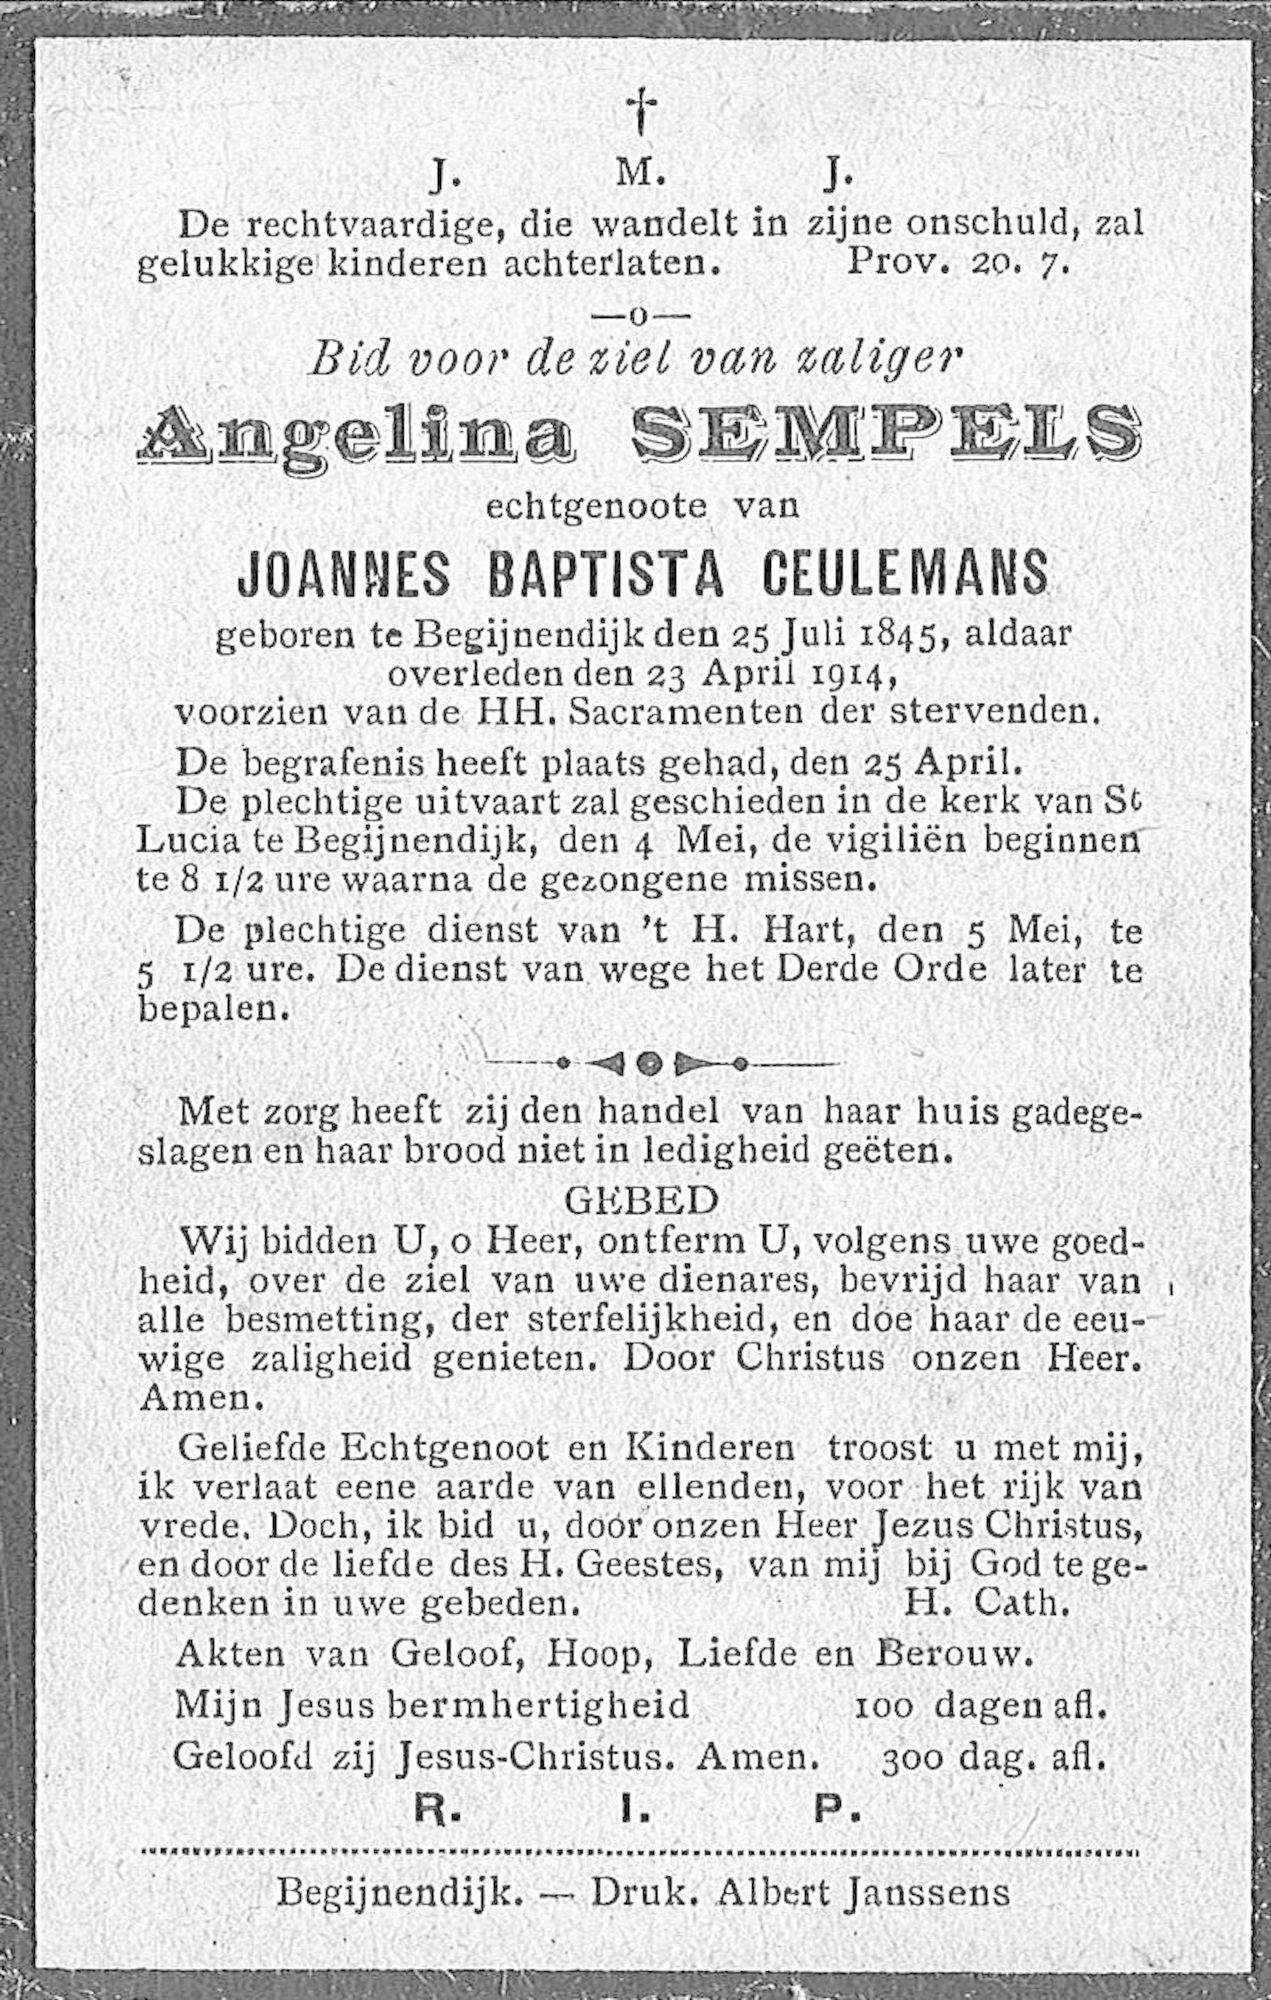 Angelina Sempels